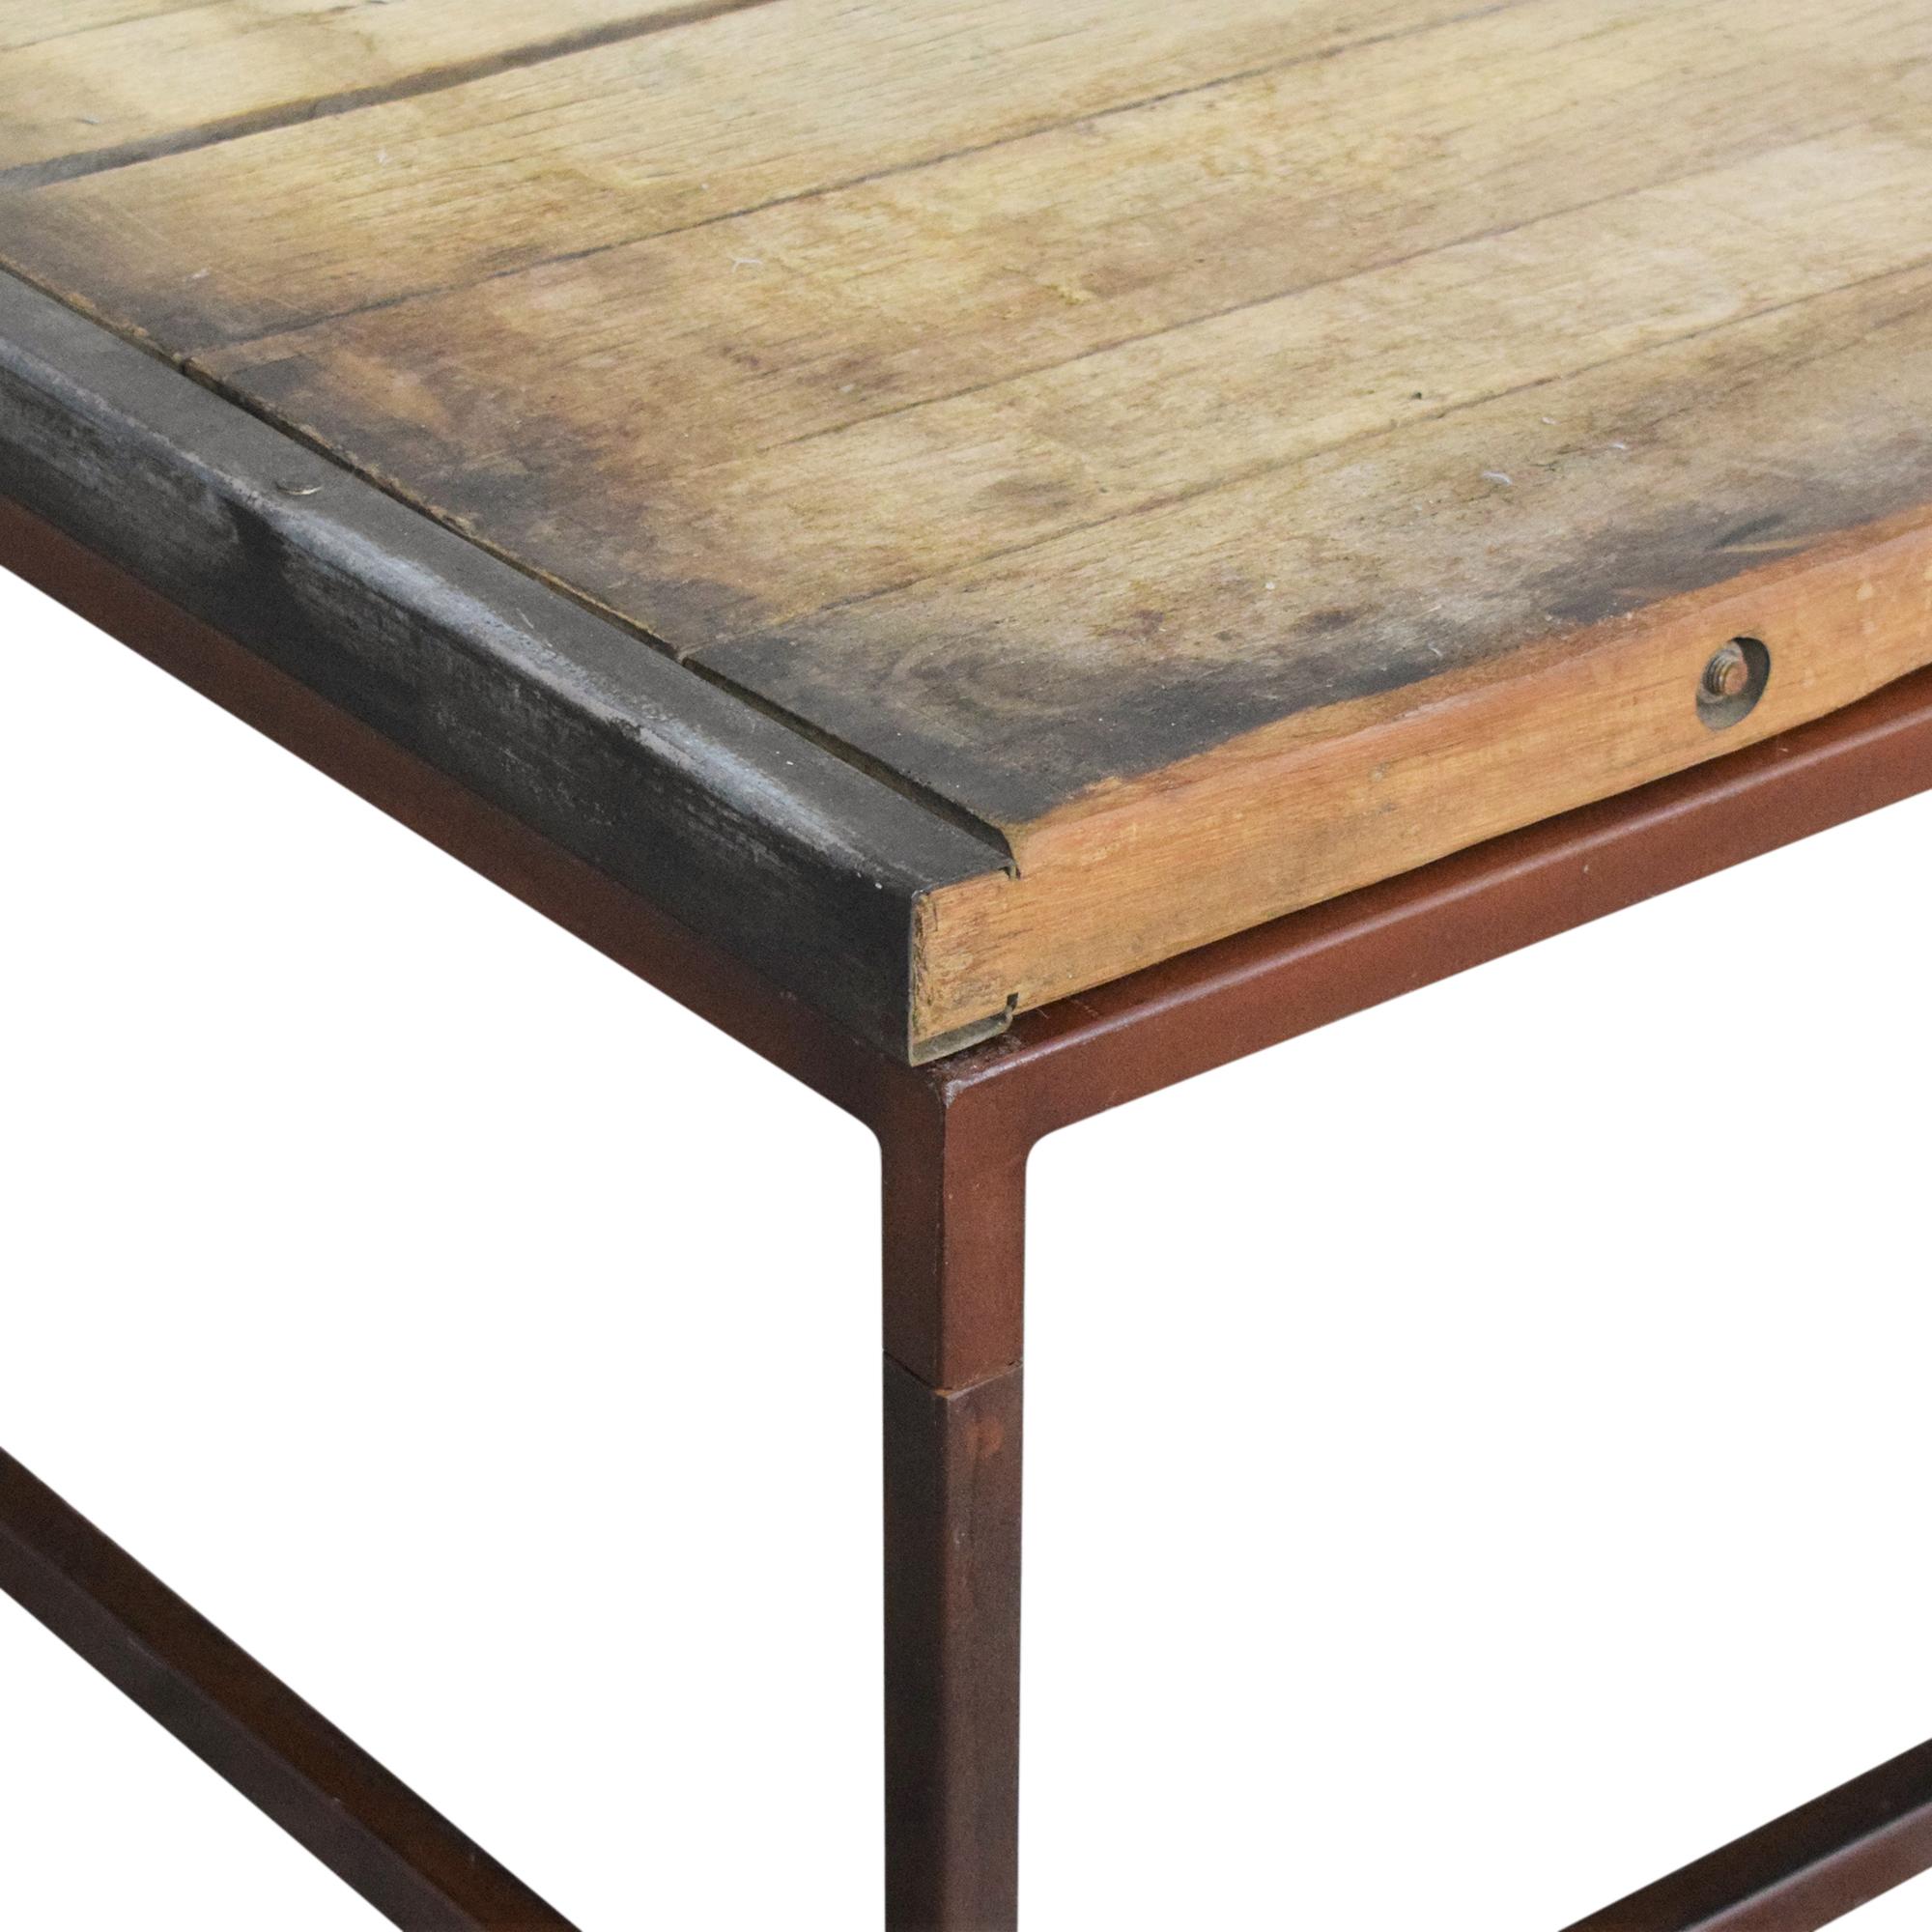 buy Restoration Hardware Brickmaker's Coffee Table Restoration Hardware Coffee Tables